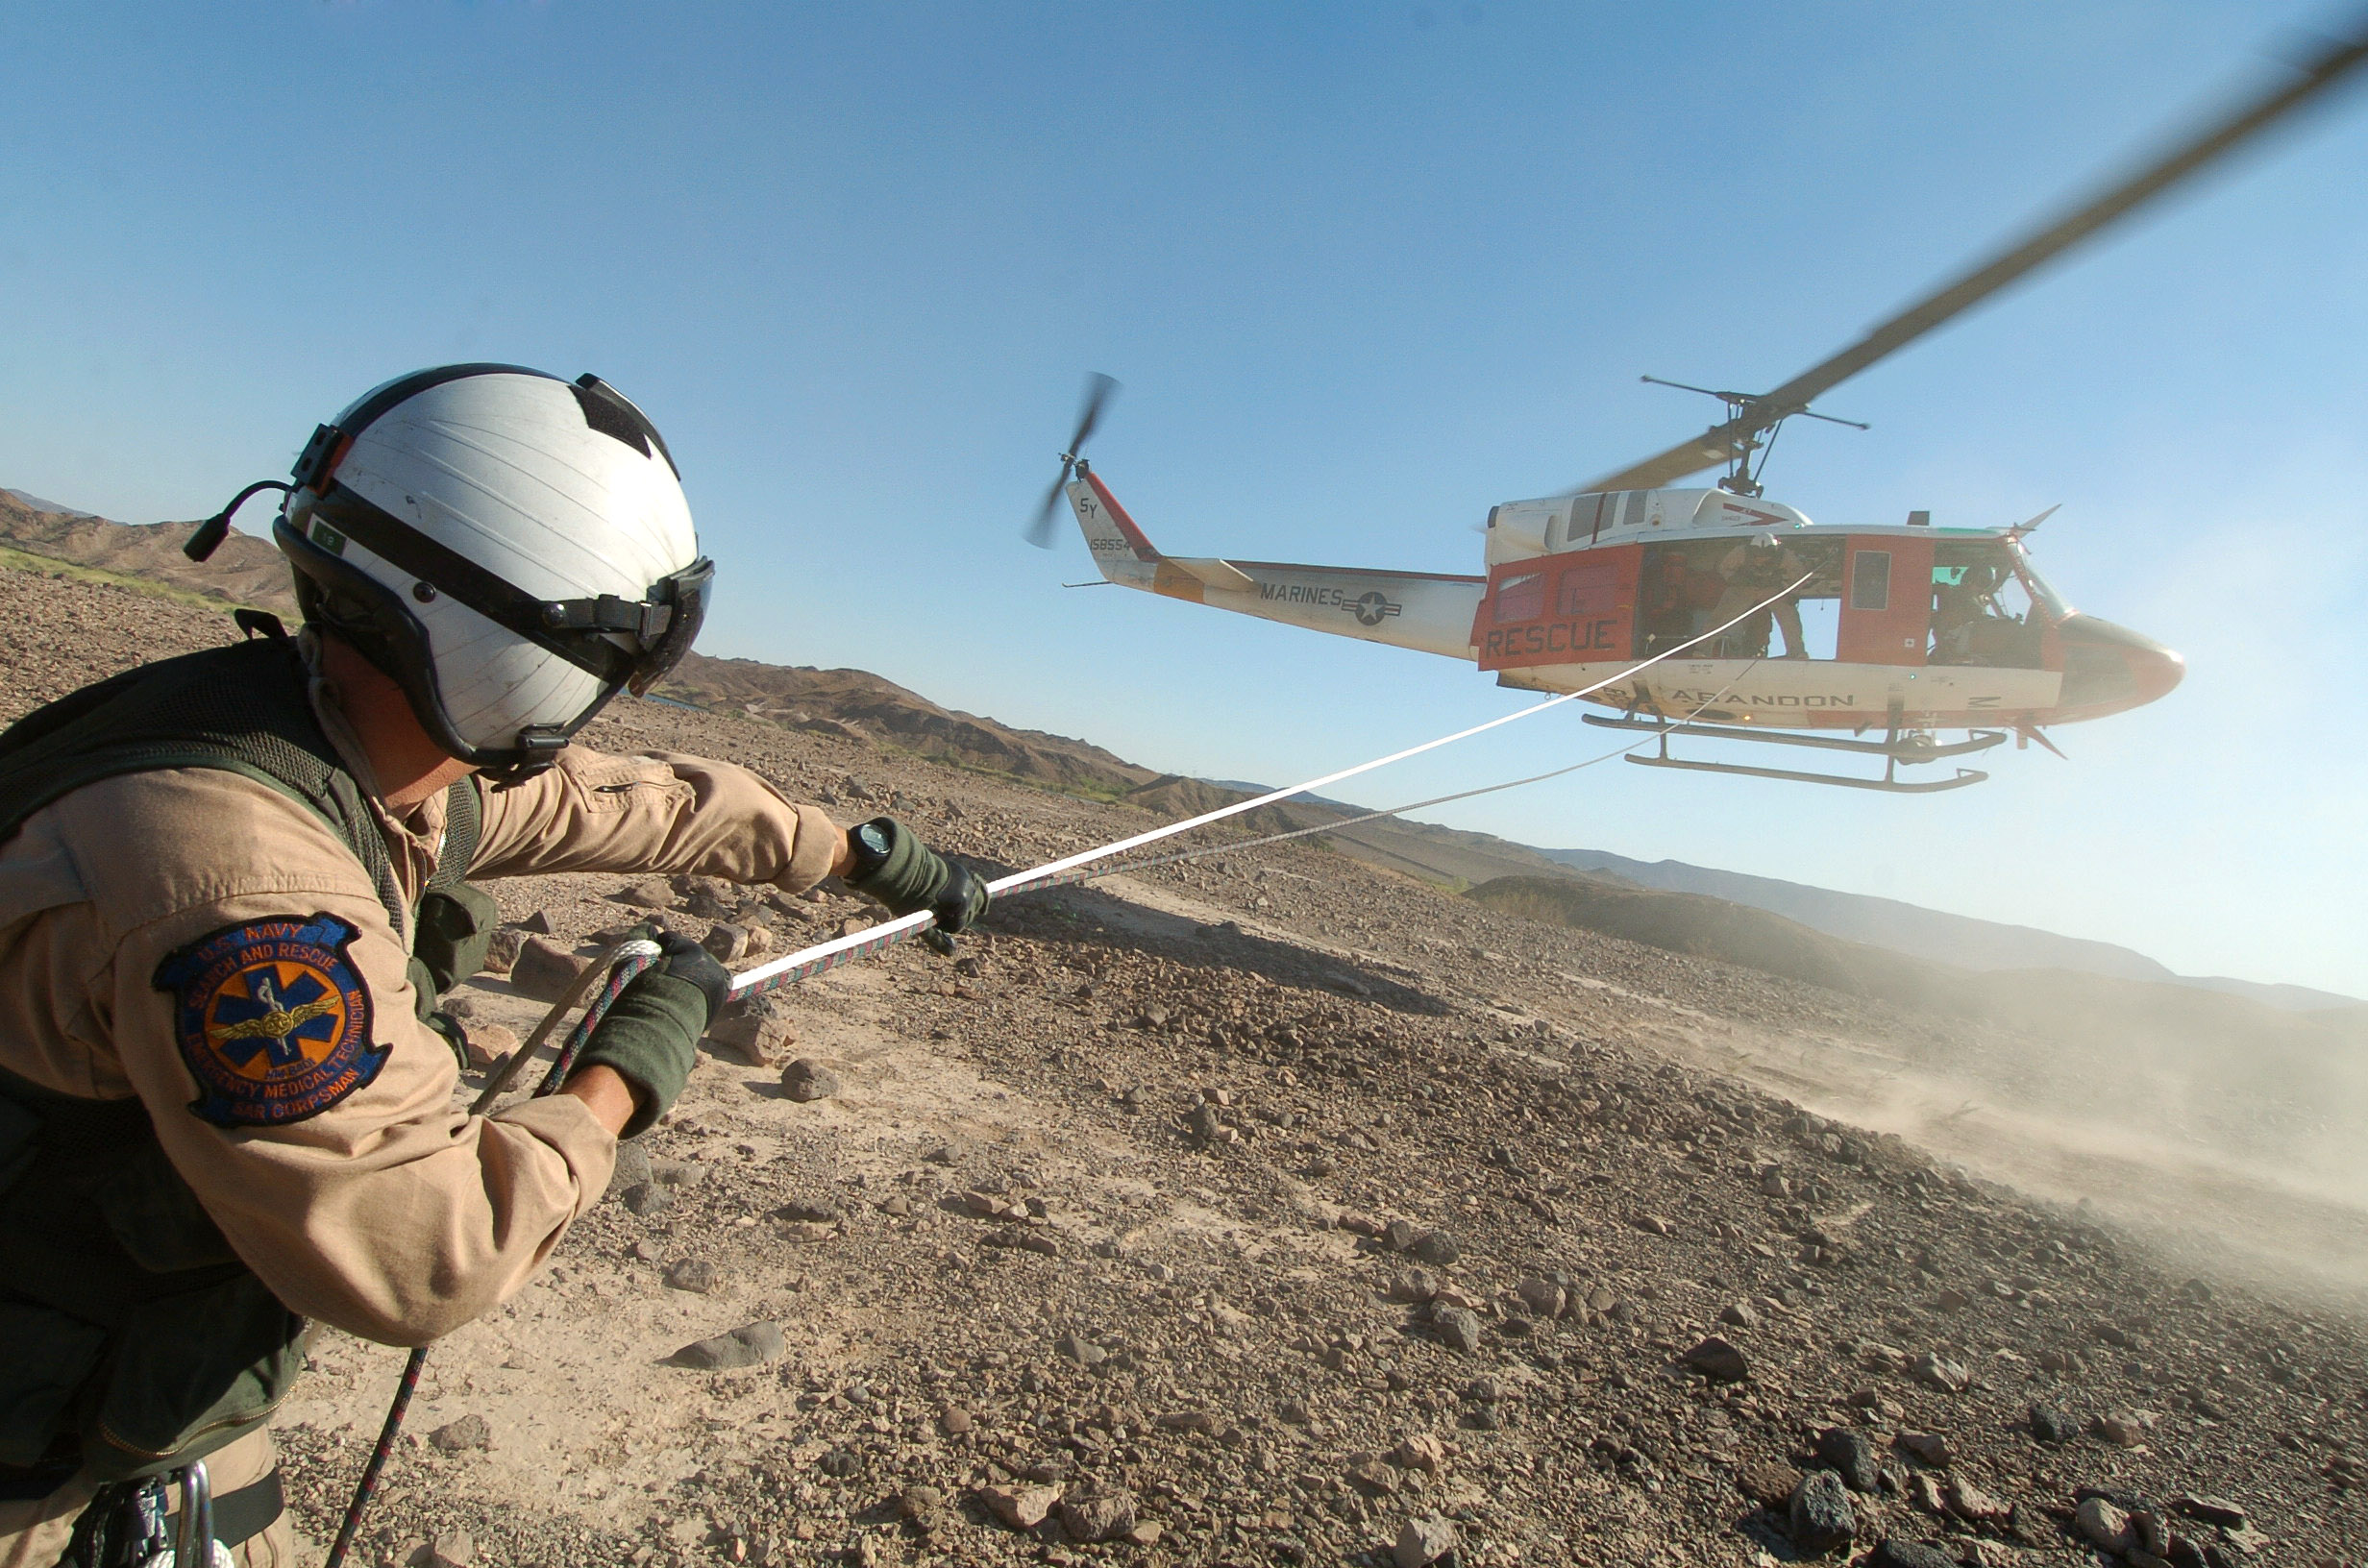 United States Marine Corps 3rd Marine Aircraft Wing